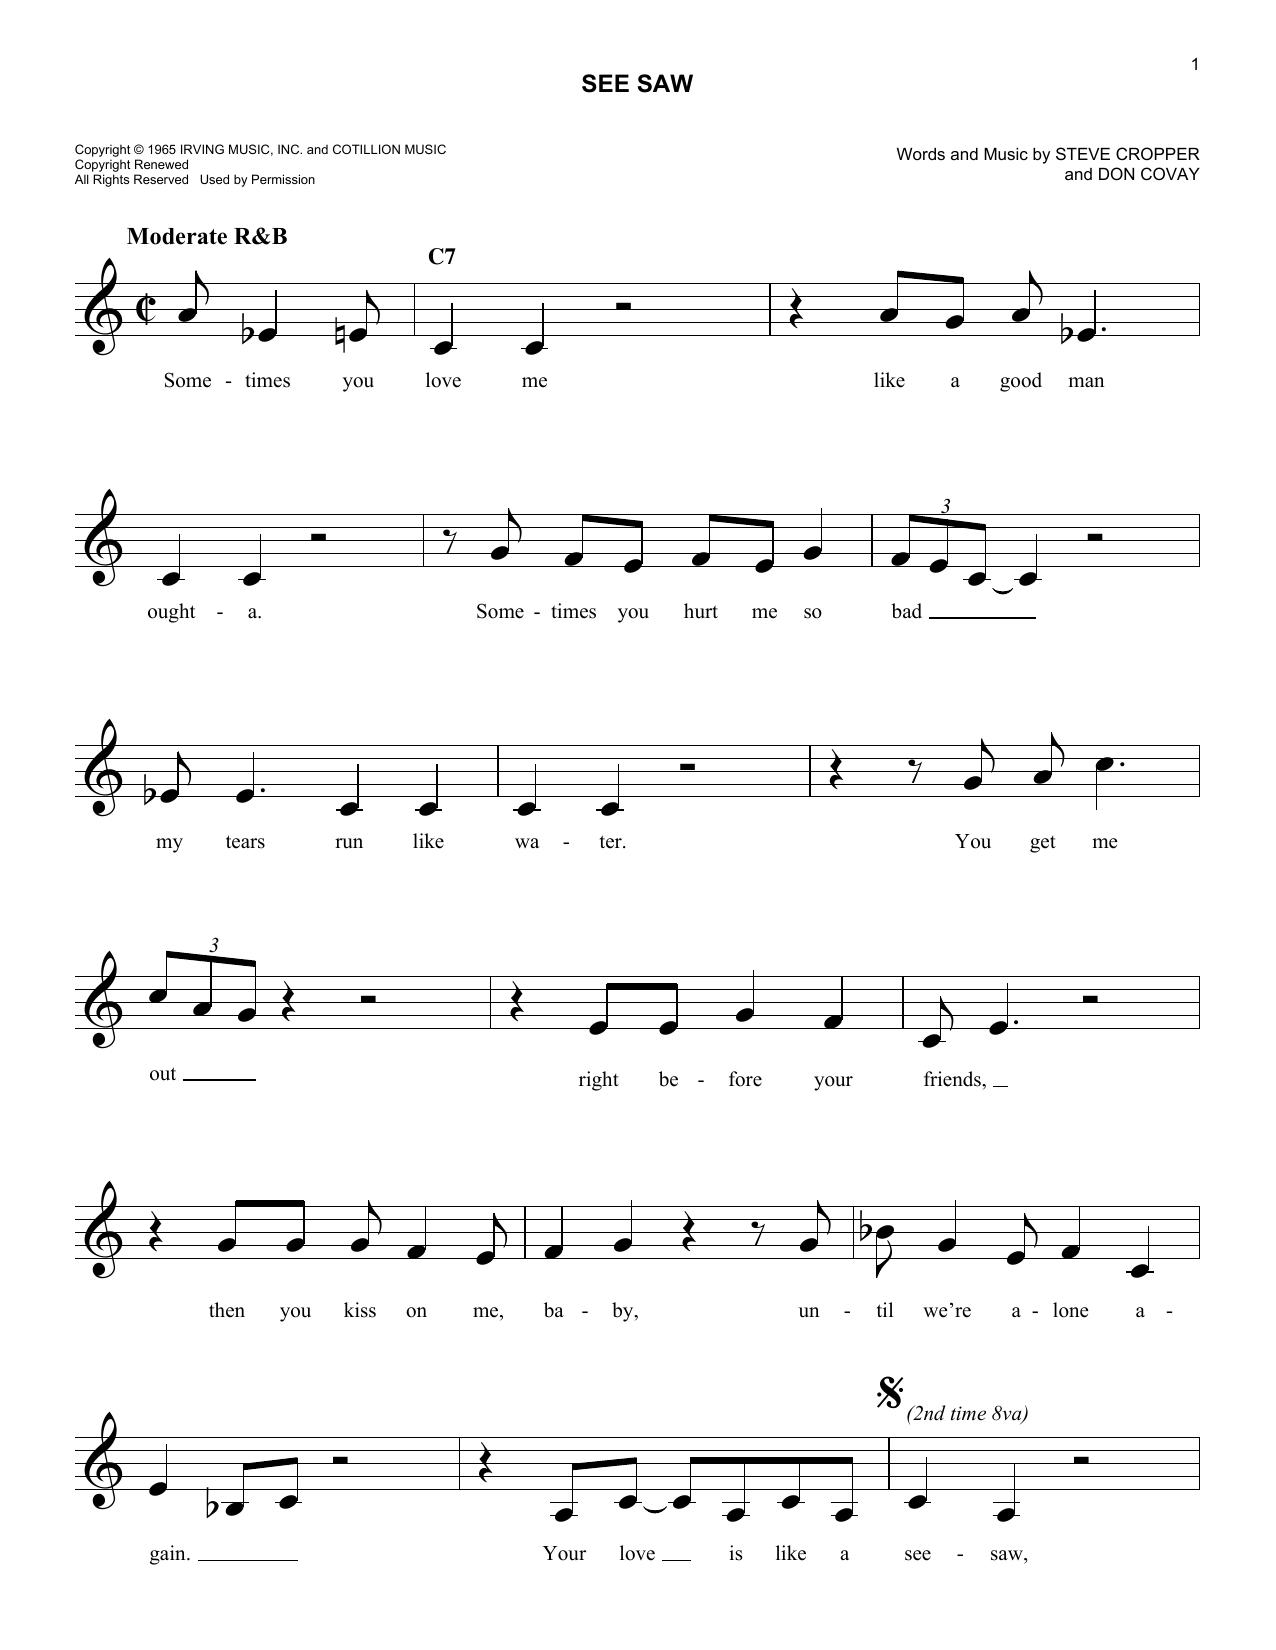 See Saw Sheet Music